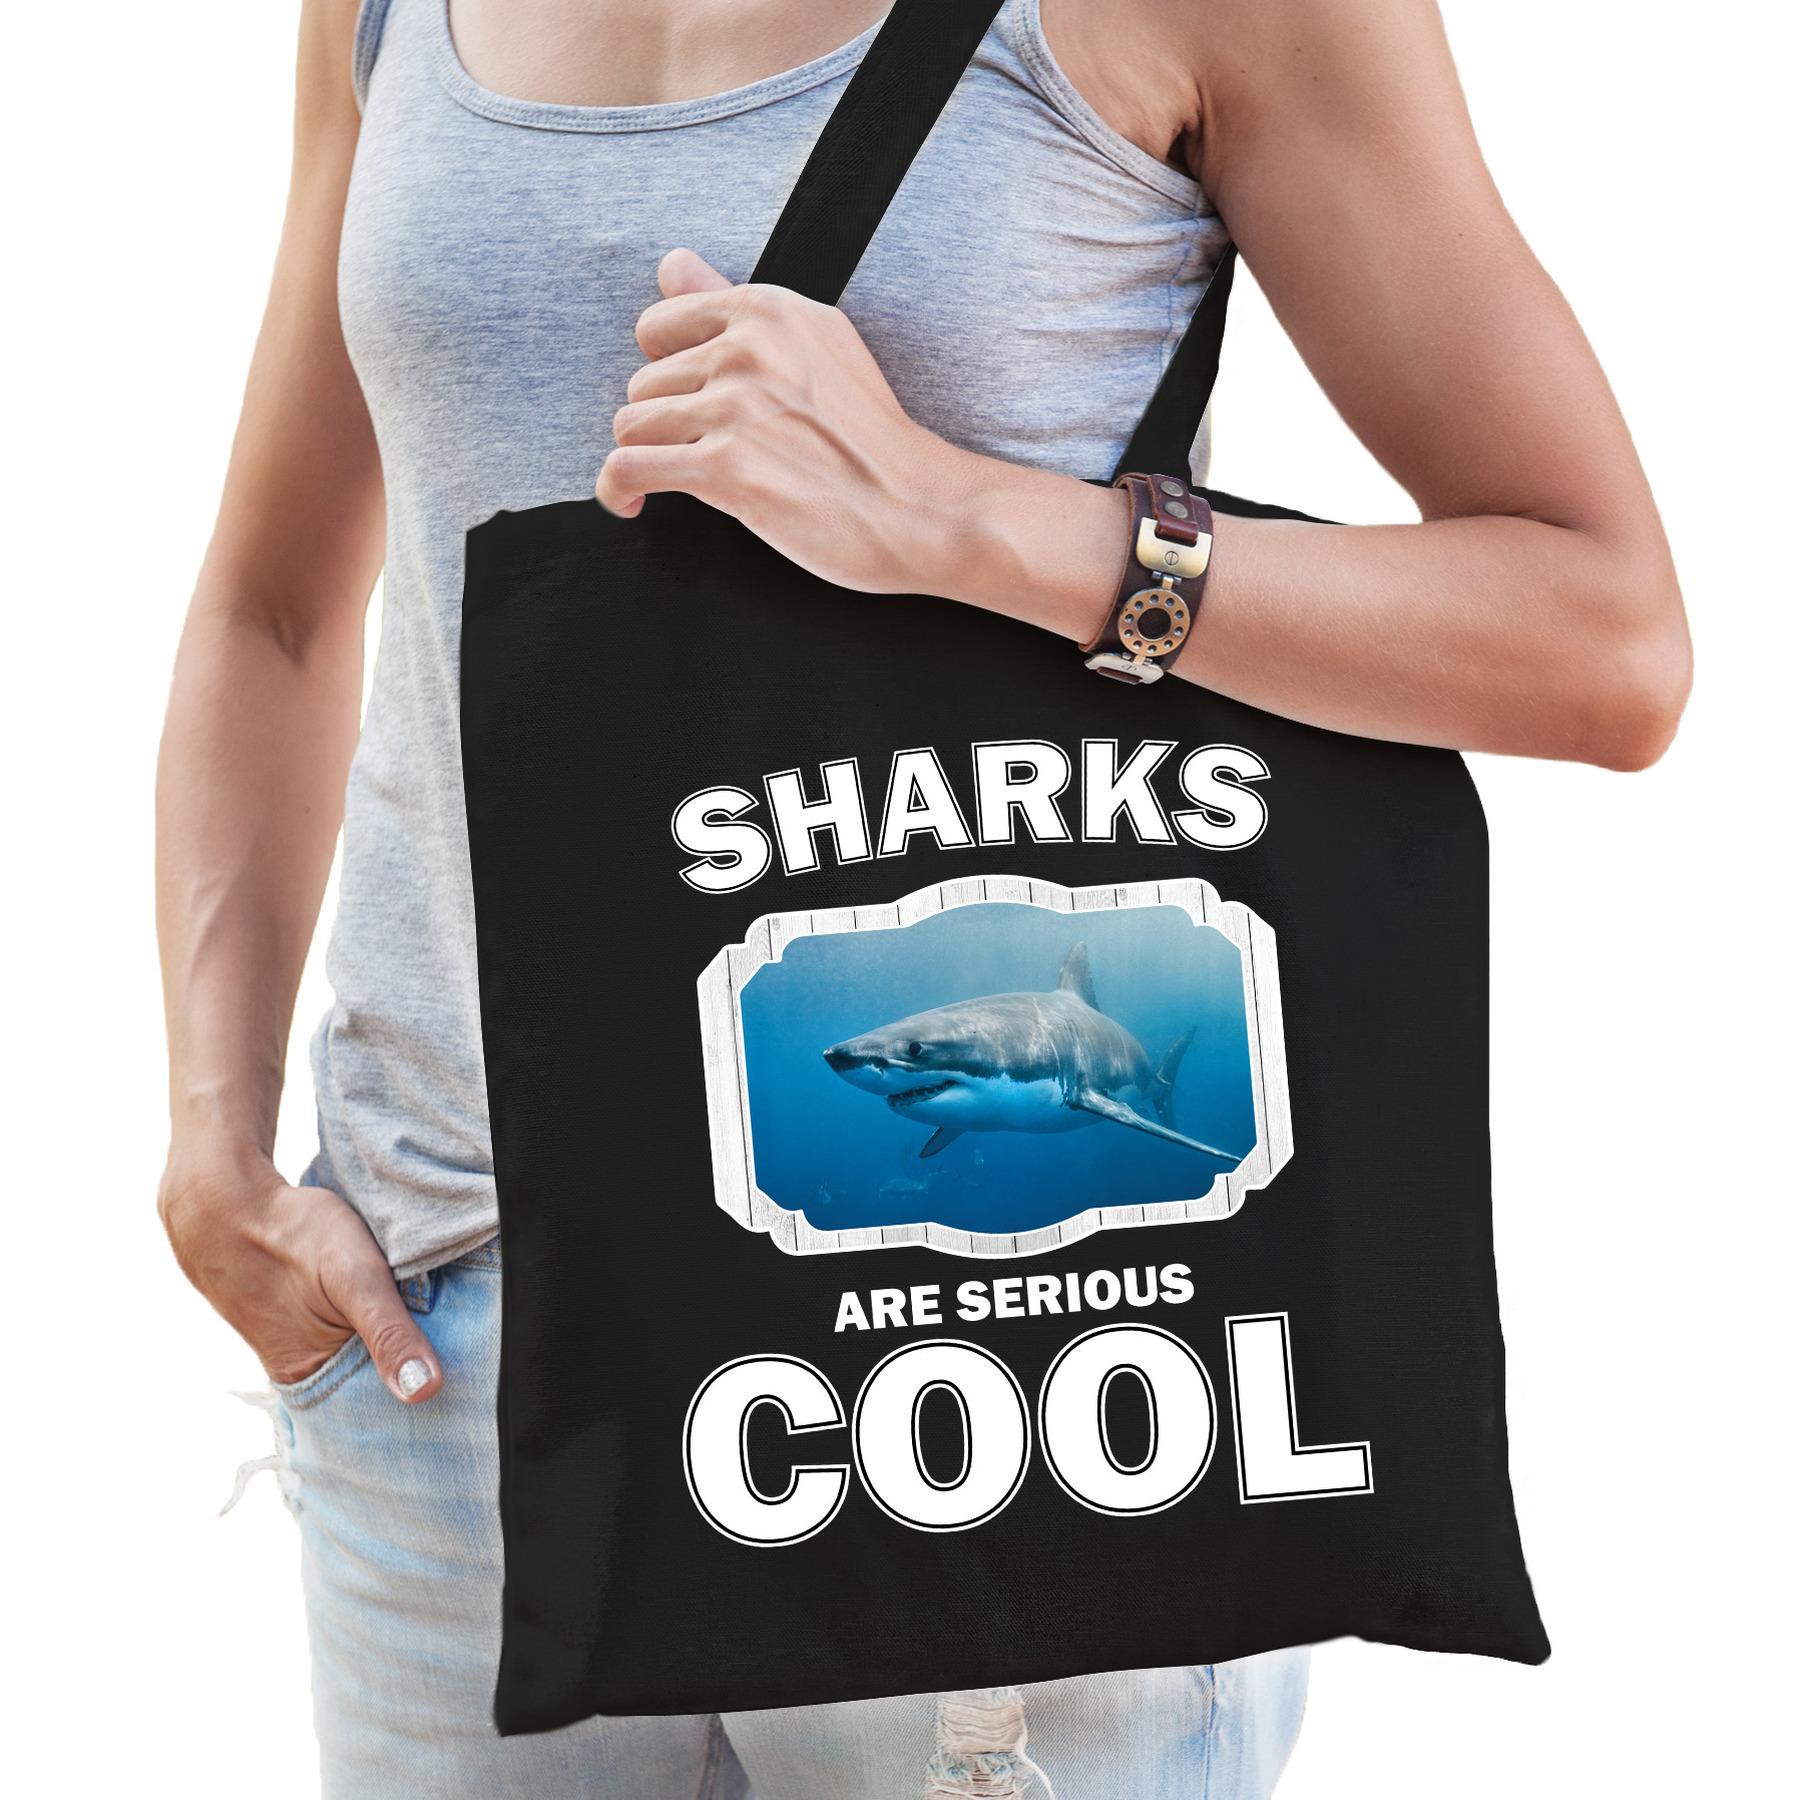 Katoenen tasje sharks are serious cool zwart - haaien/ haai cadeau tas